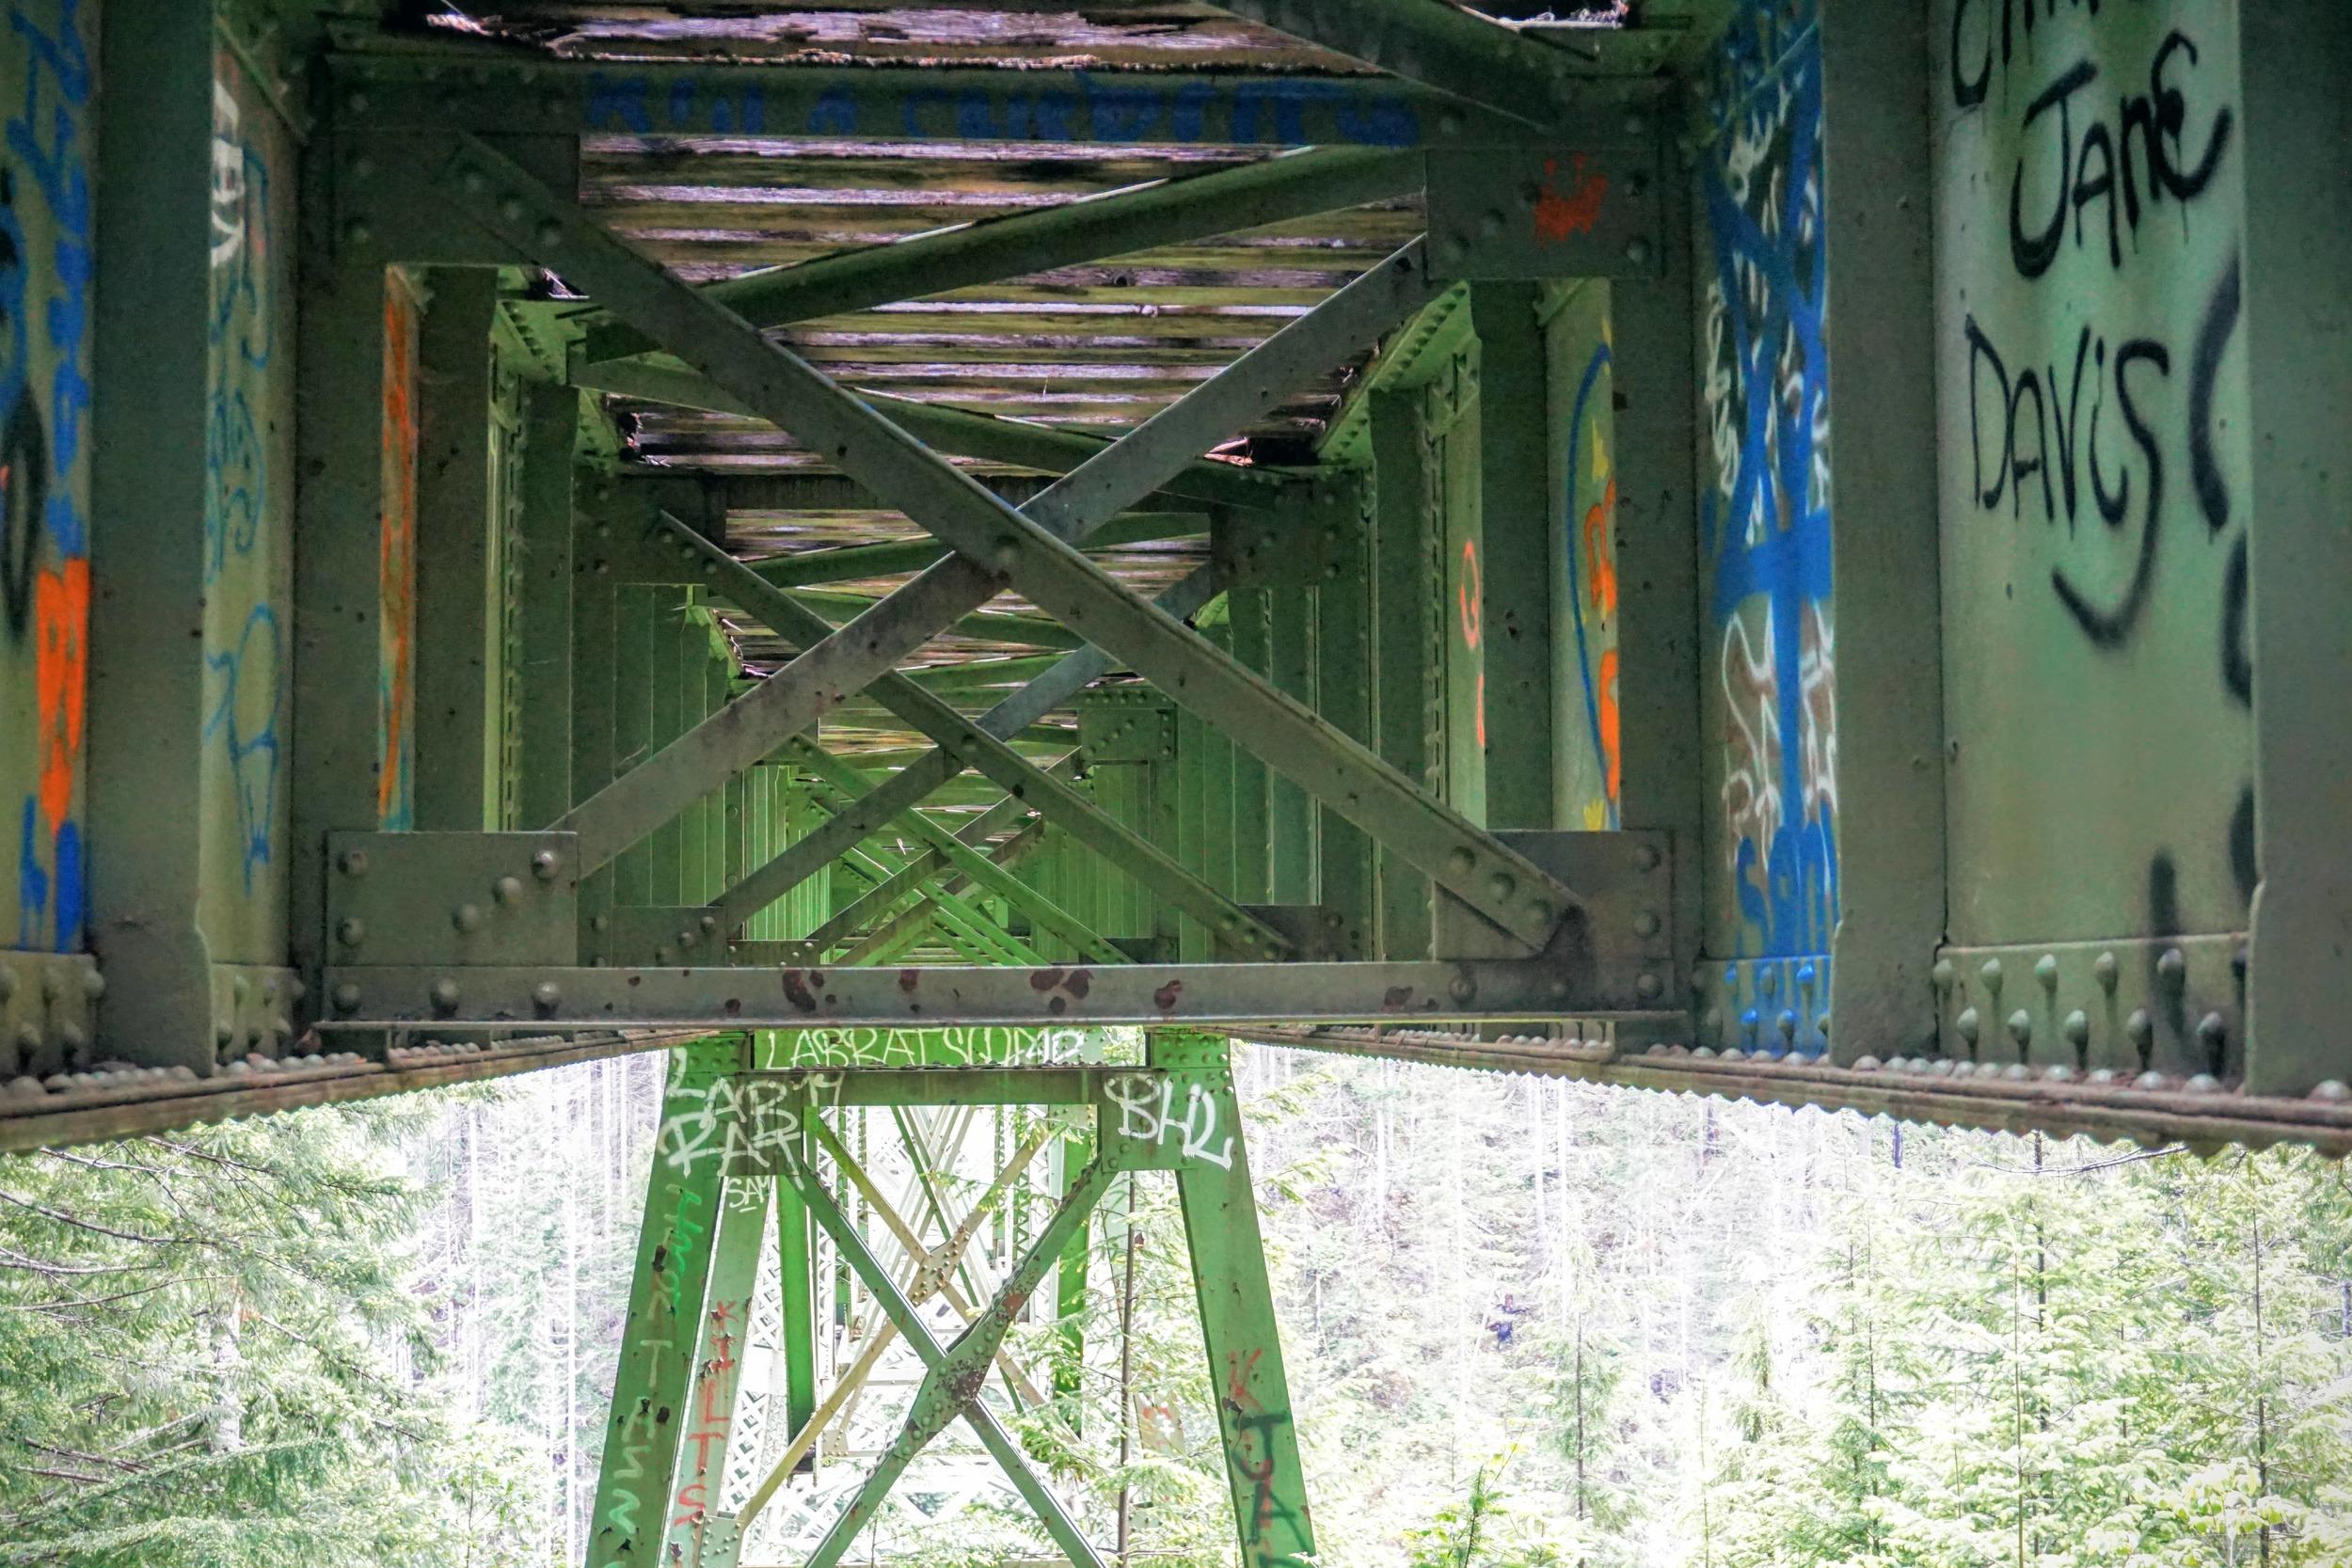 Vance Creek Bridge